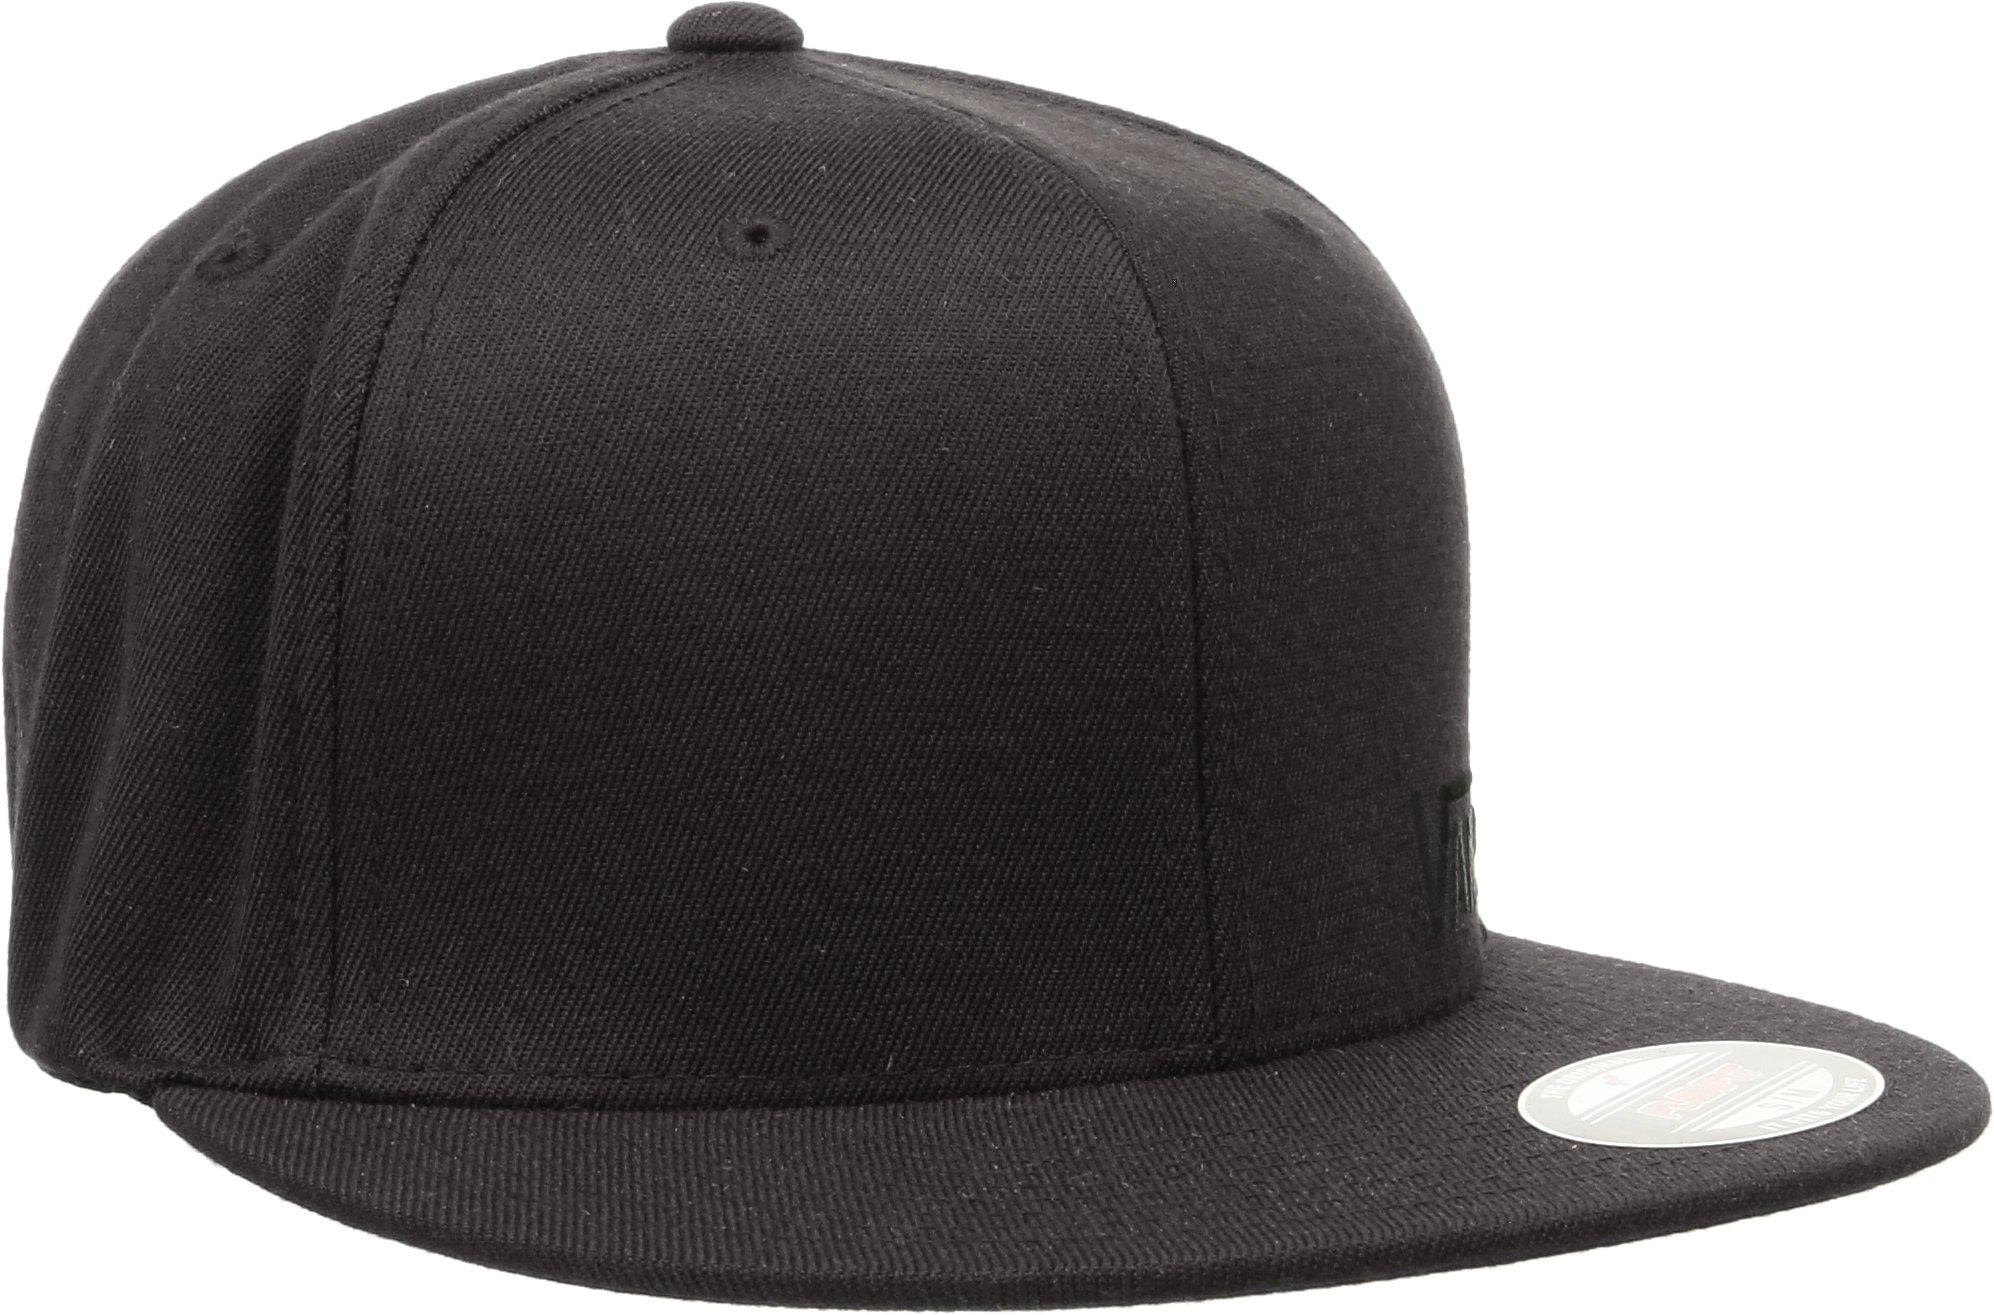 1fa6af50cb0d76 Vans Splitz, Cappello con visiera da uomo - SGMStore